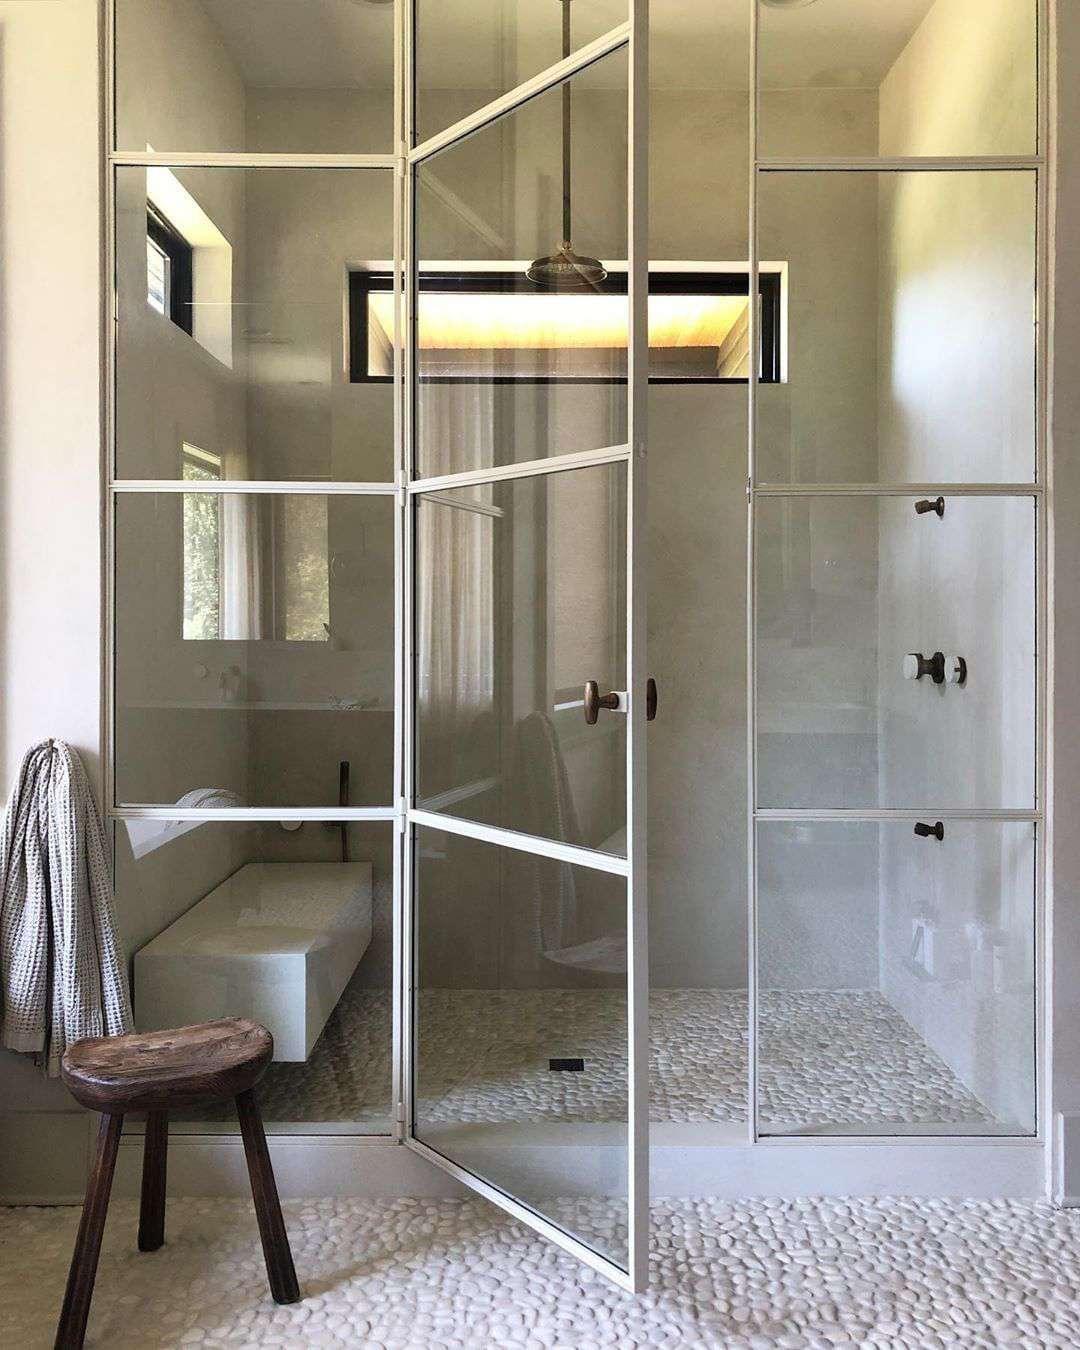 Bathroom with pebble tile